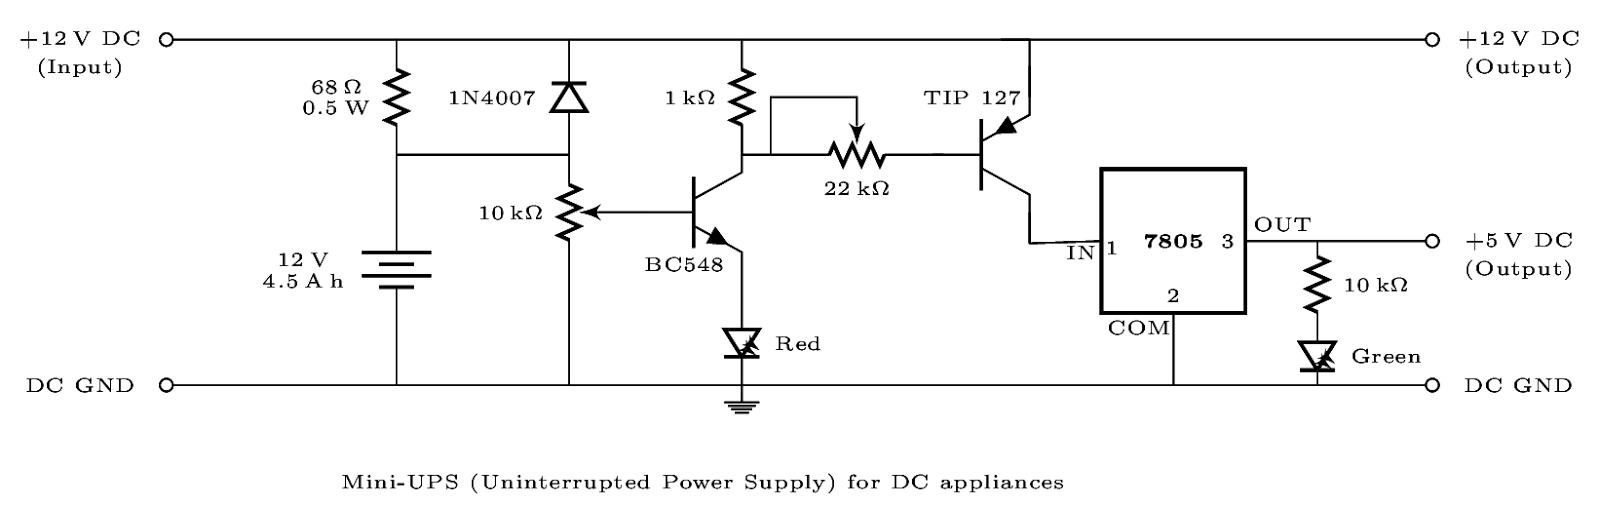 technical musings drawing circuit diagrams in latex draw circuit diagram latex [ 1600 x 507 Pixel ]